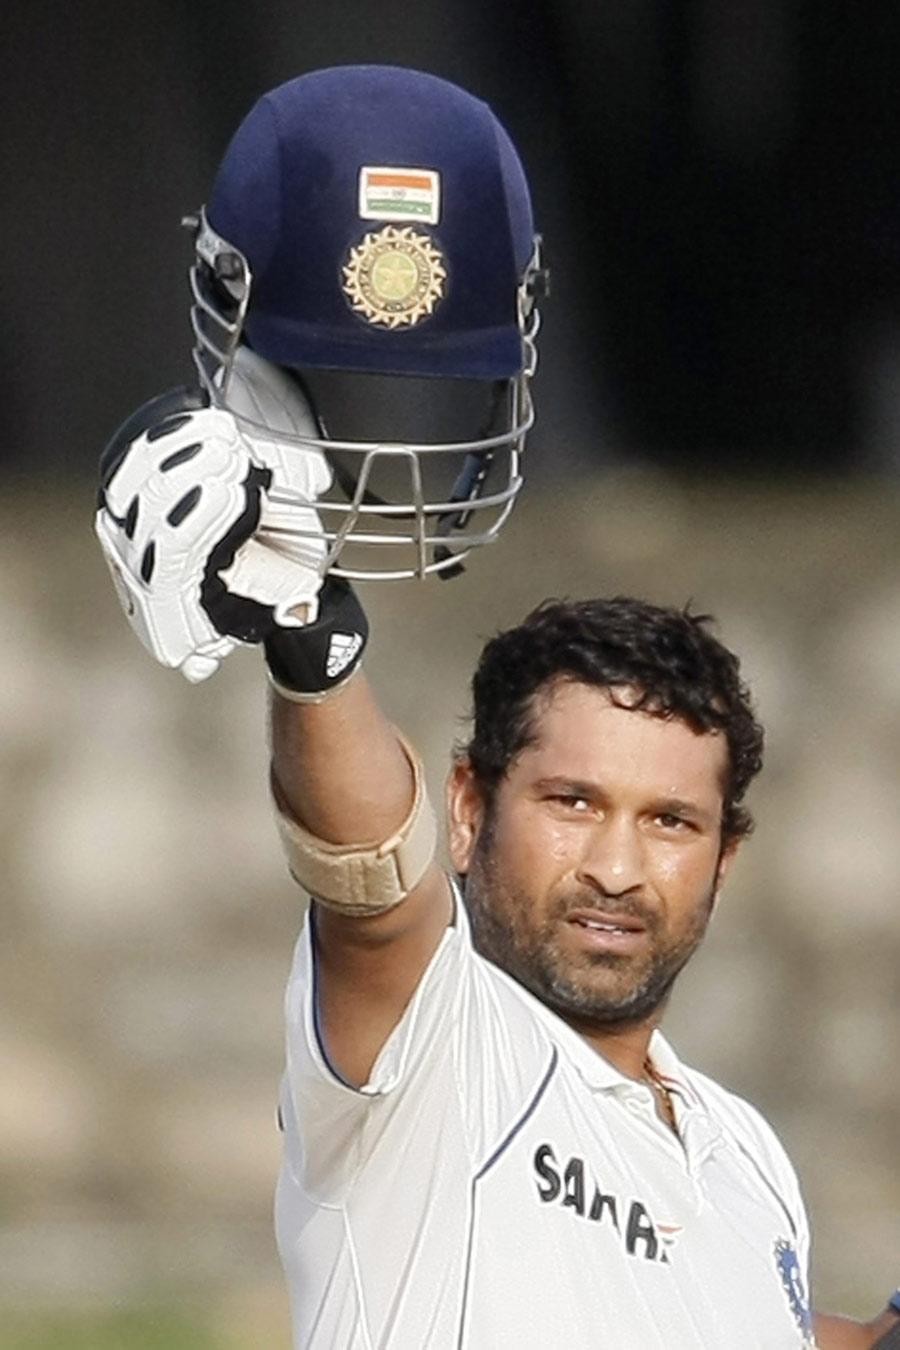 Sachin Tendulkar signals century No. 48